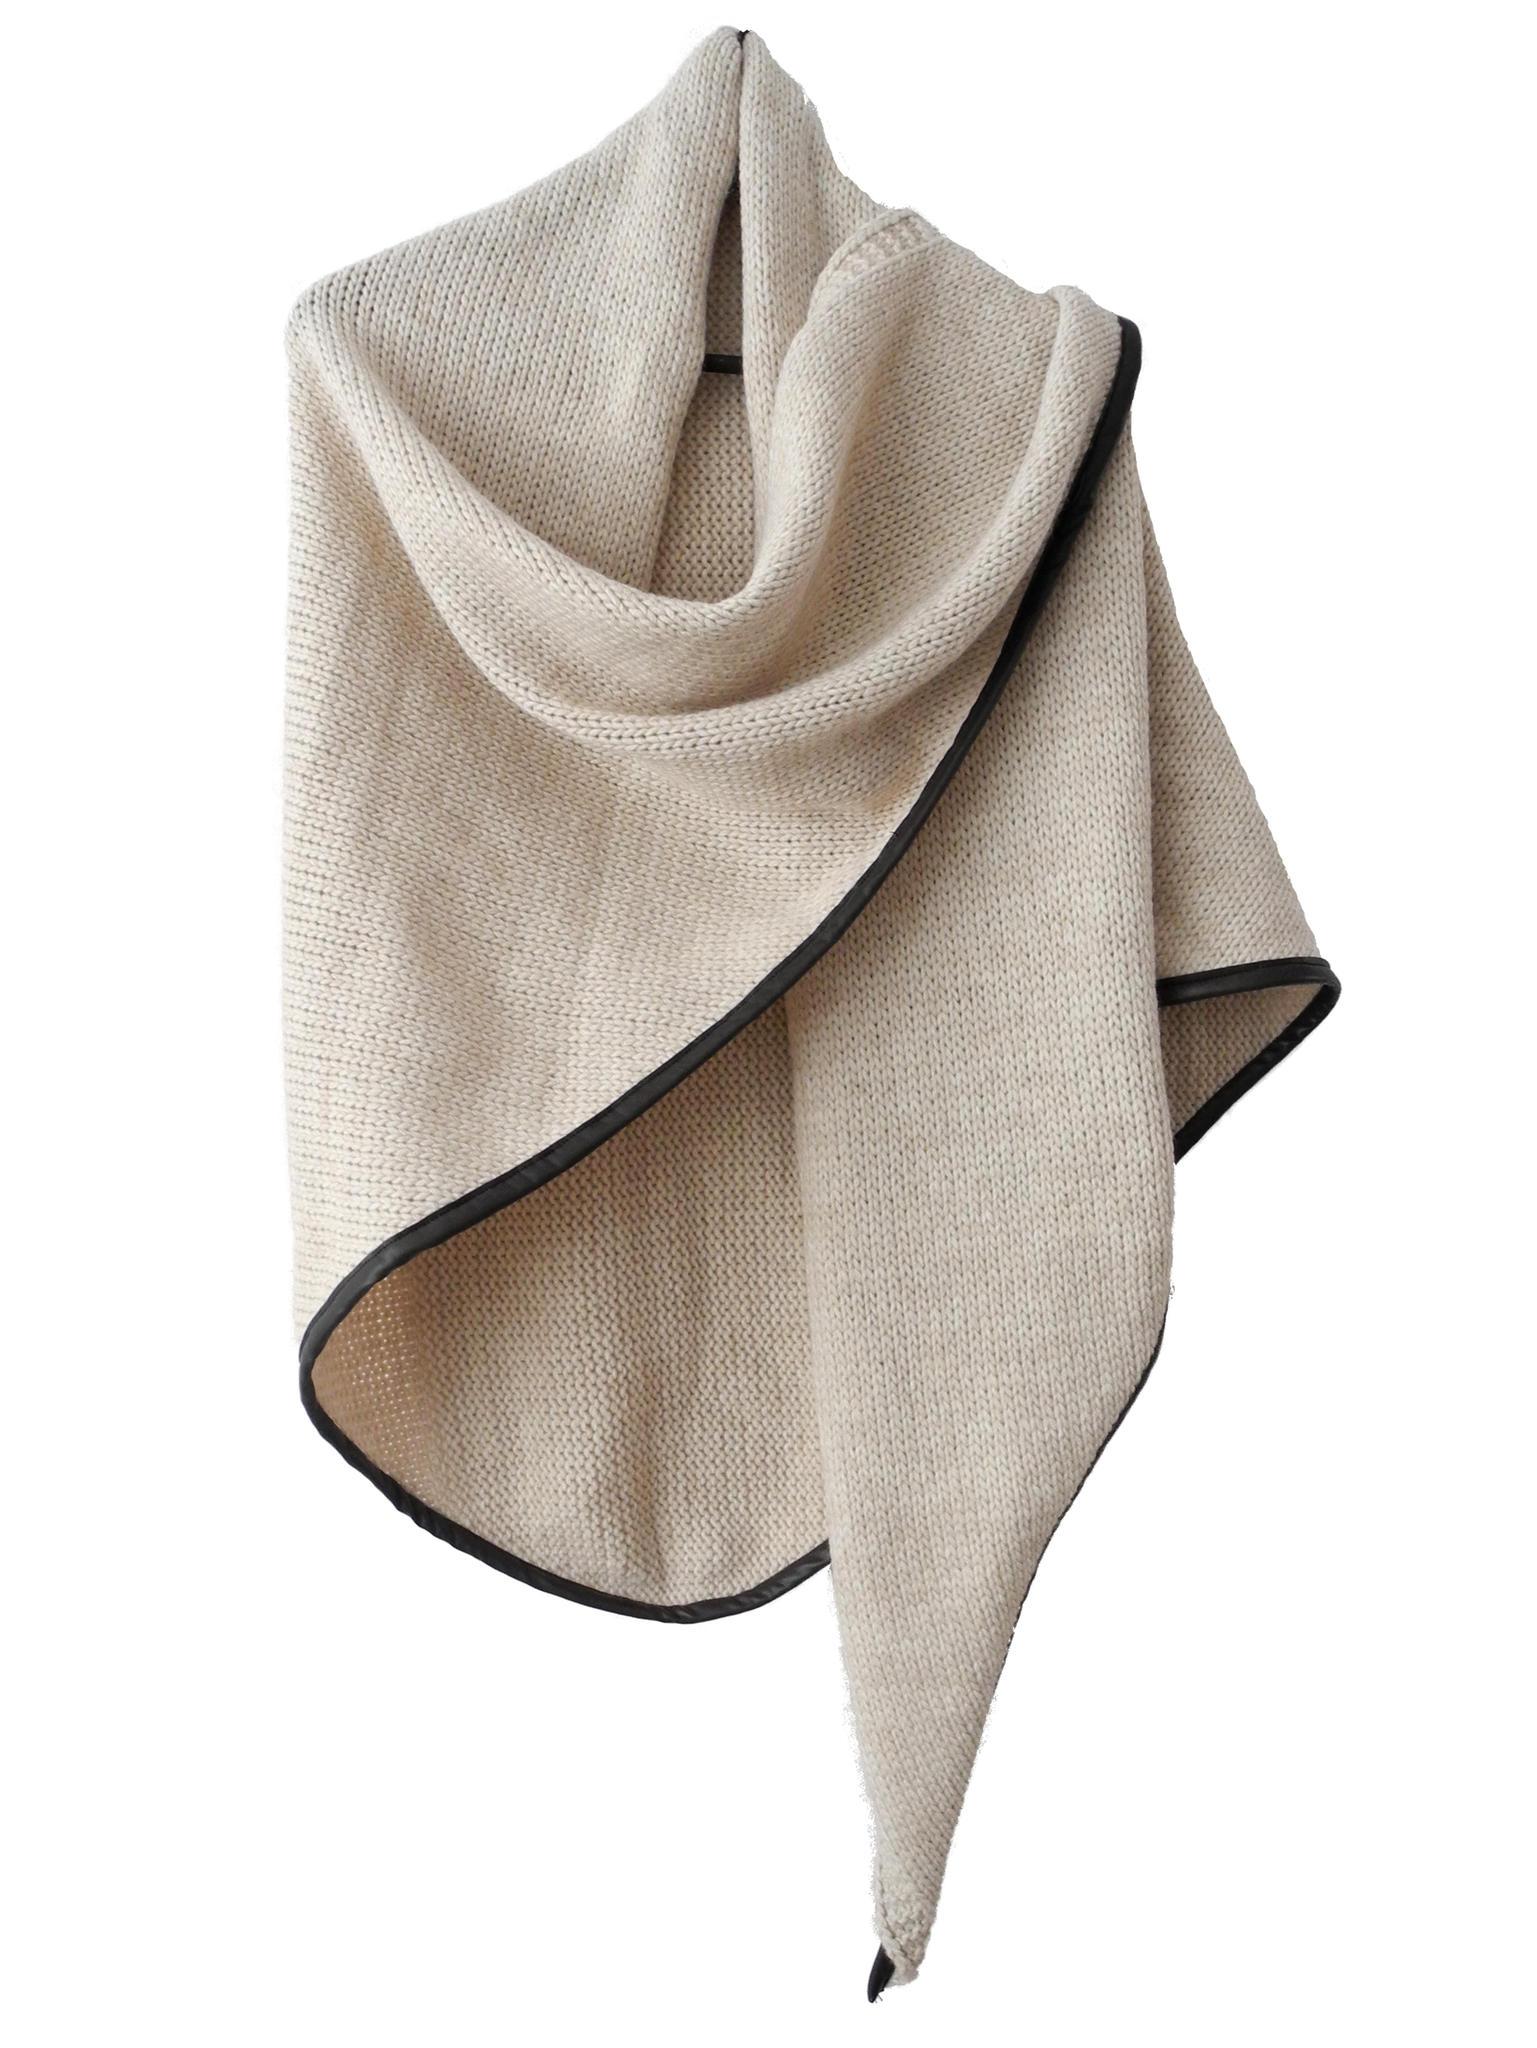 omslagdoek sjaalmania sand